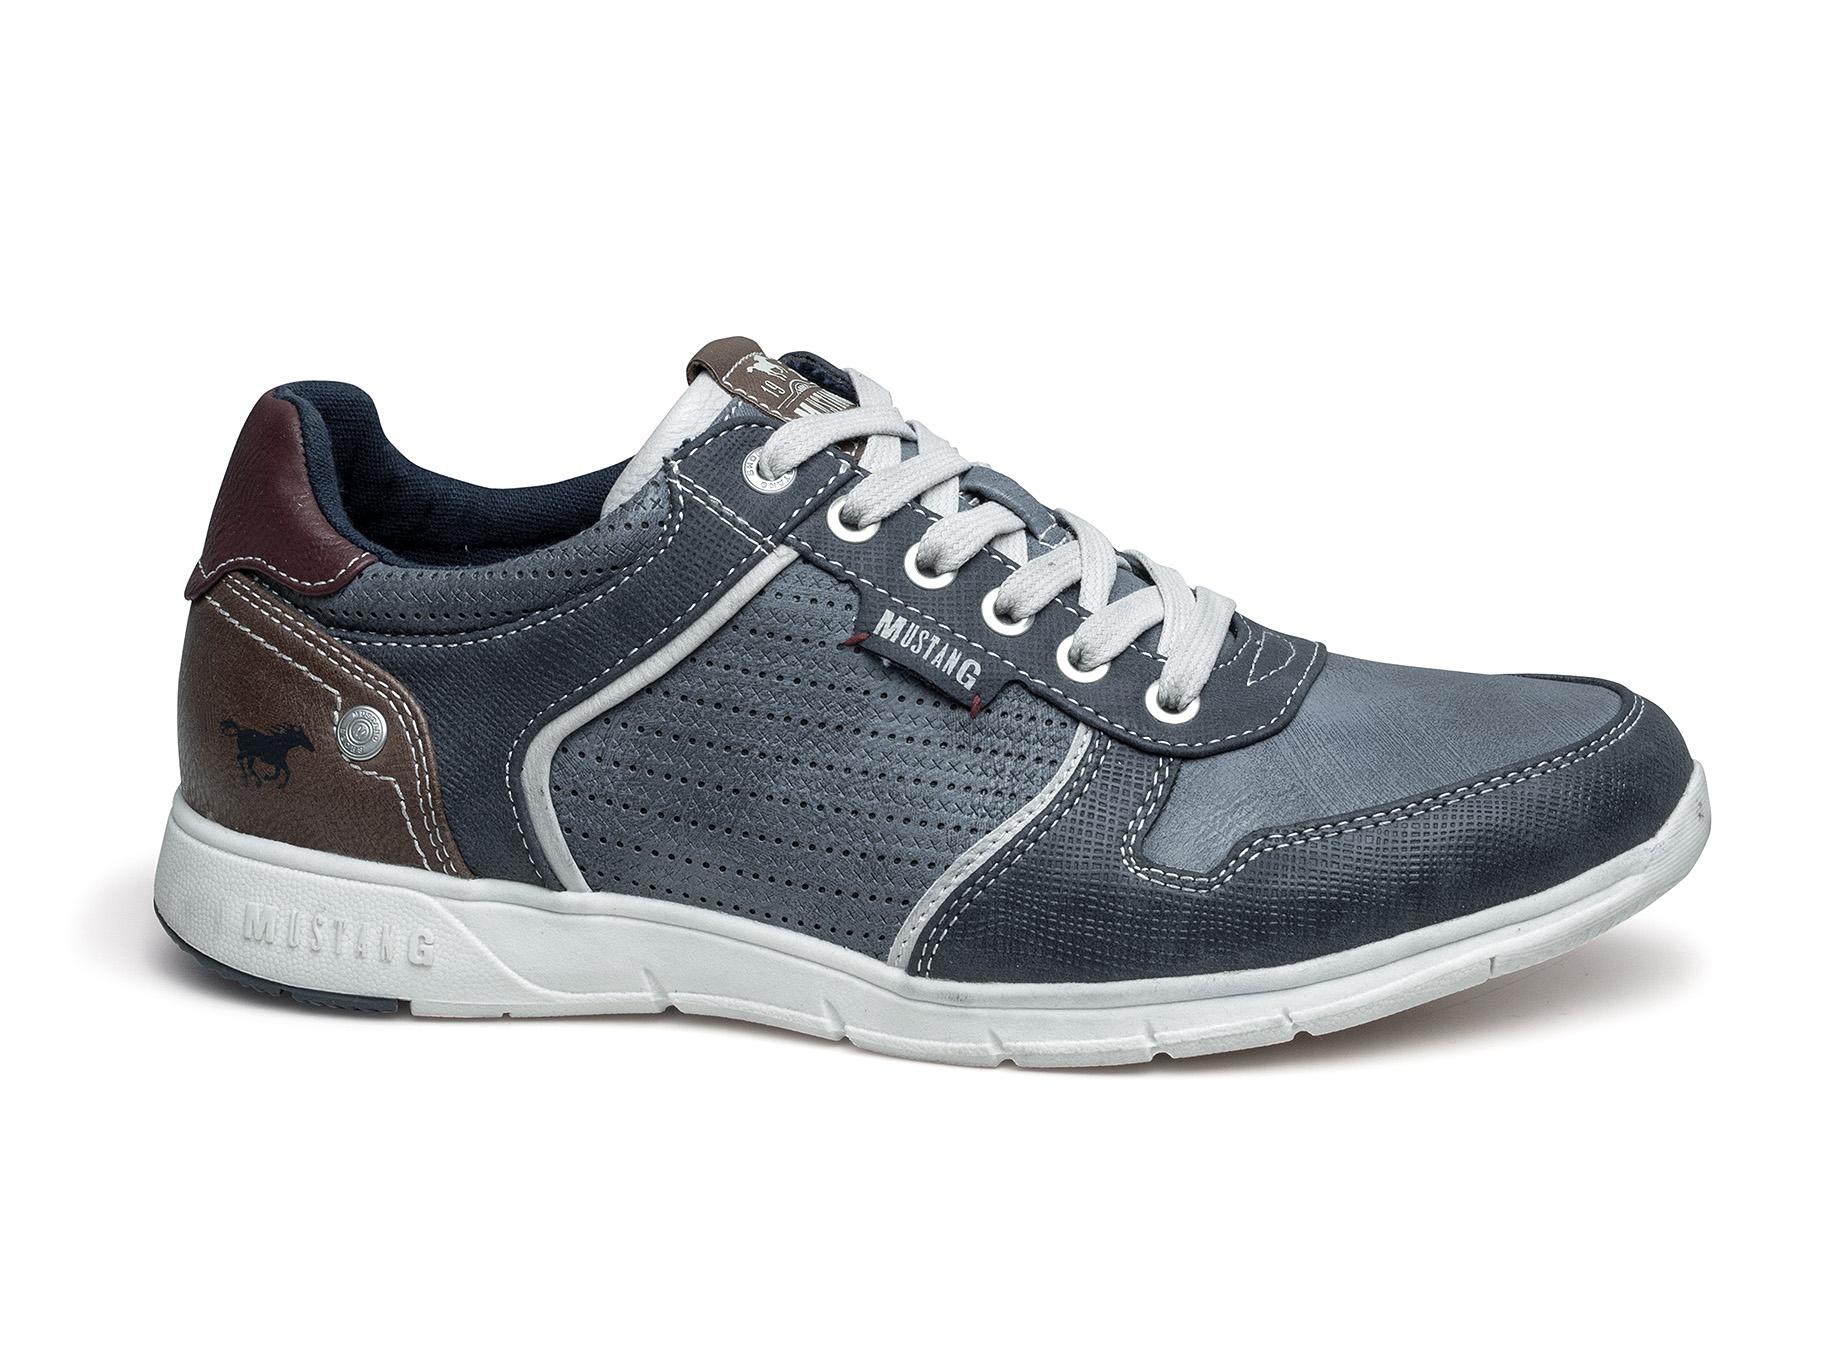 9846c32b49 Mustang boty shoes buty schuhe topánky chaussure cipő čevlje schoenen scarpe  zapatos batai pantofi sko skor ...